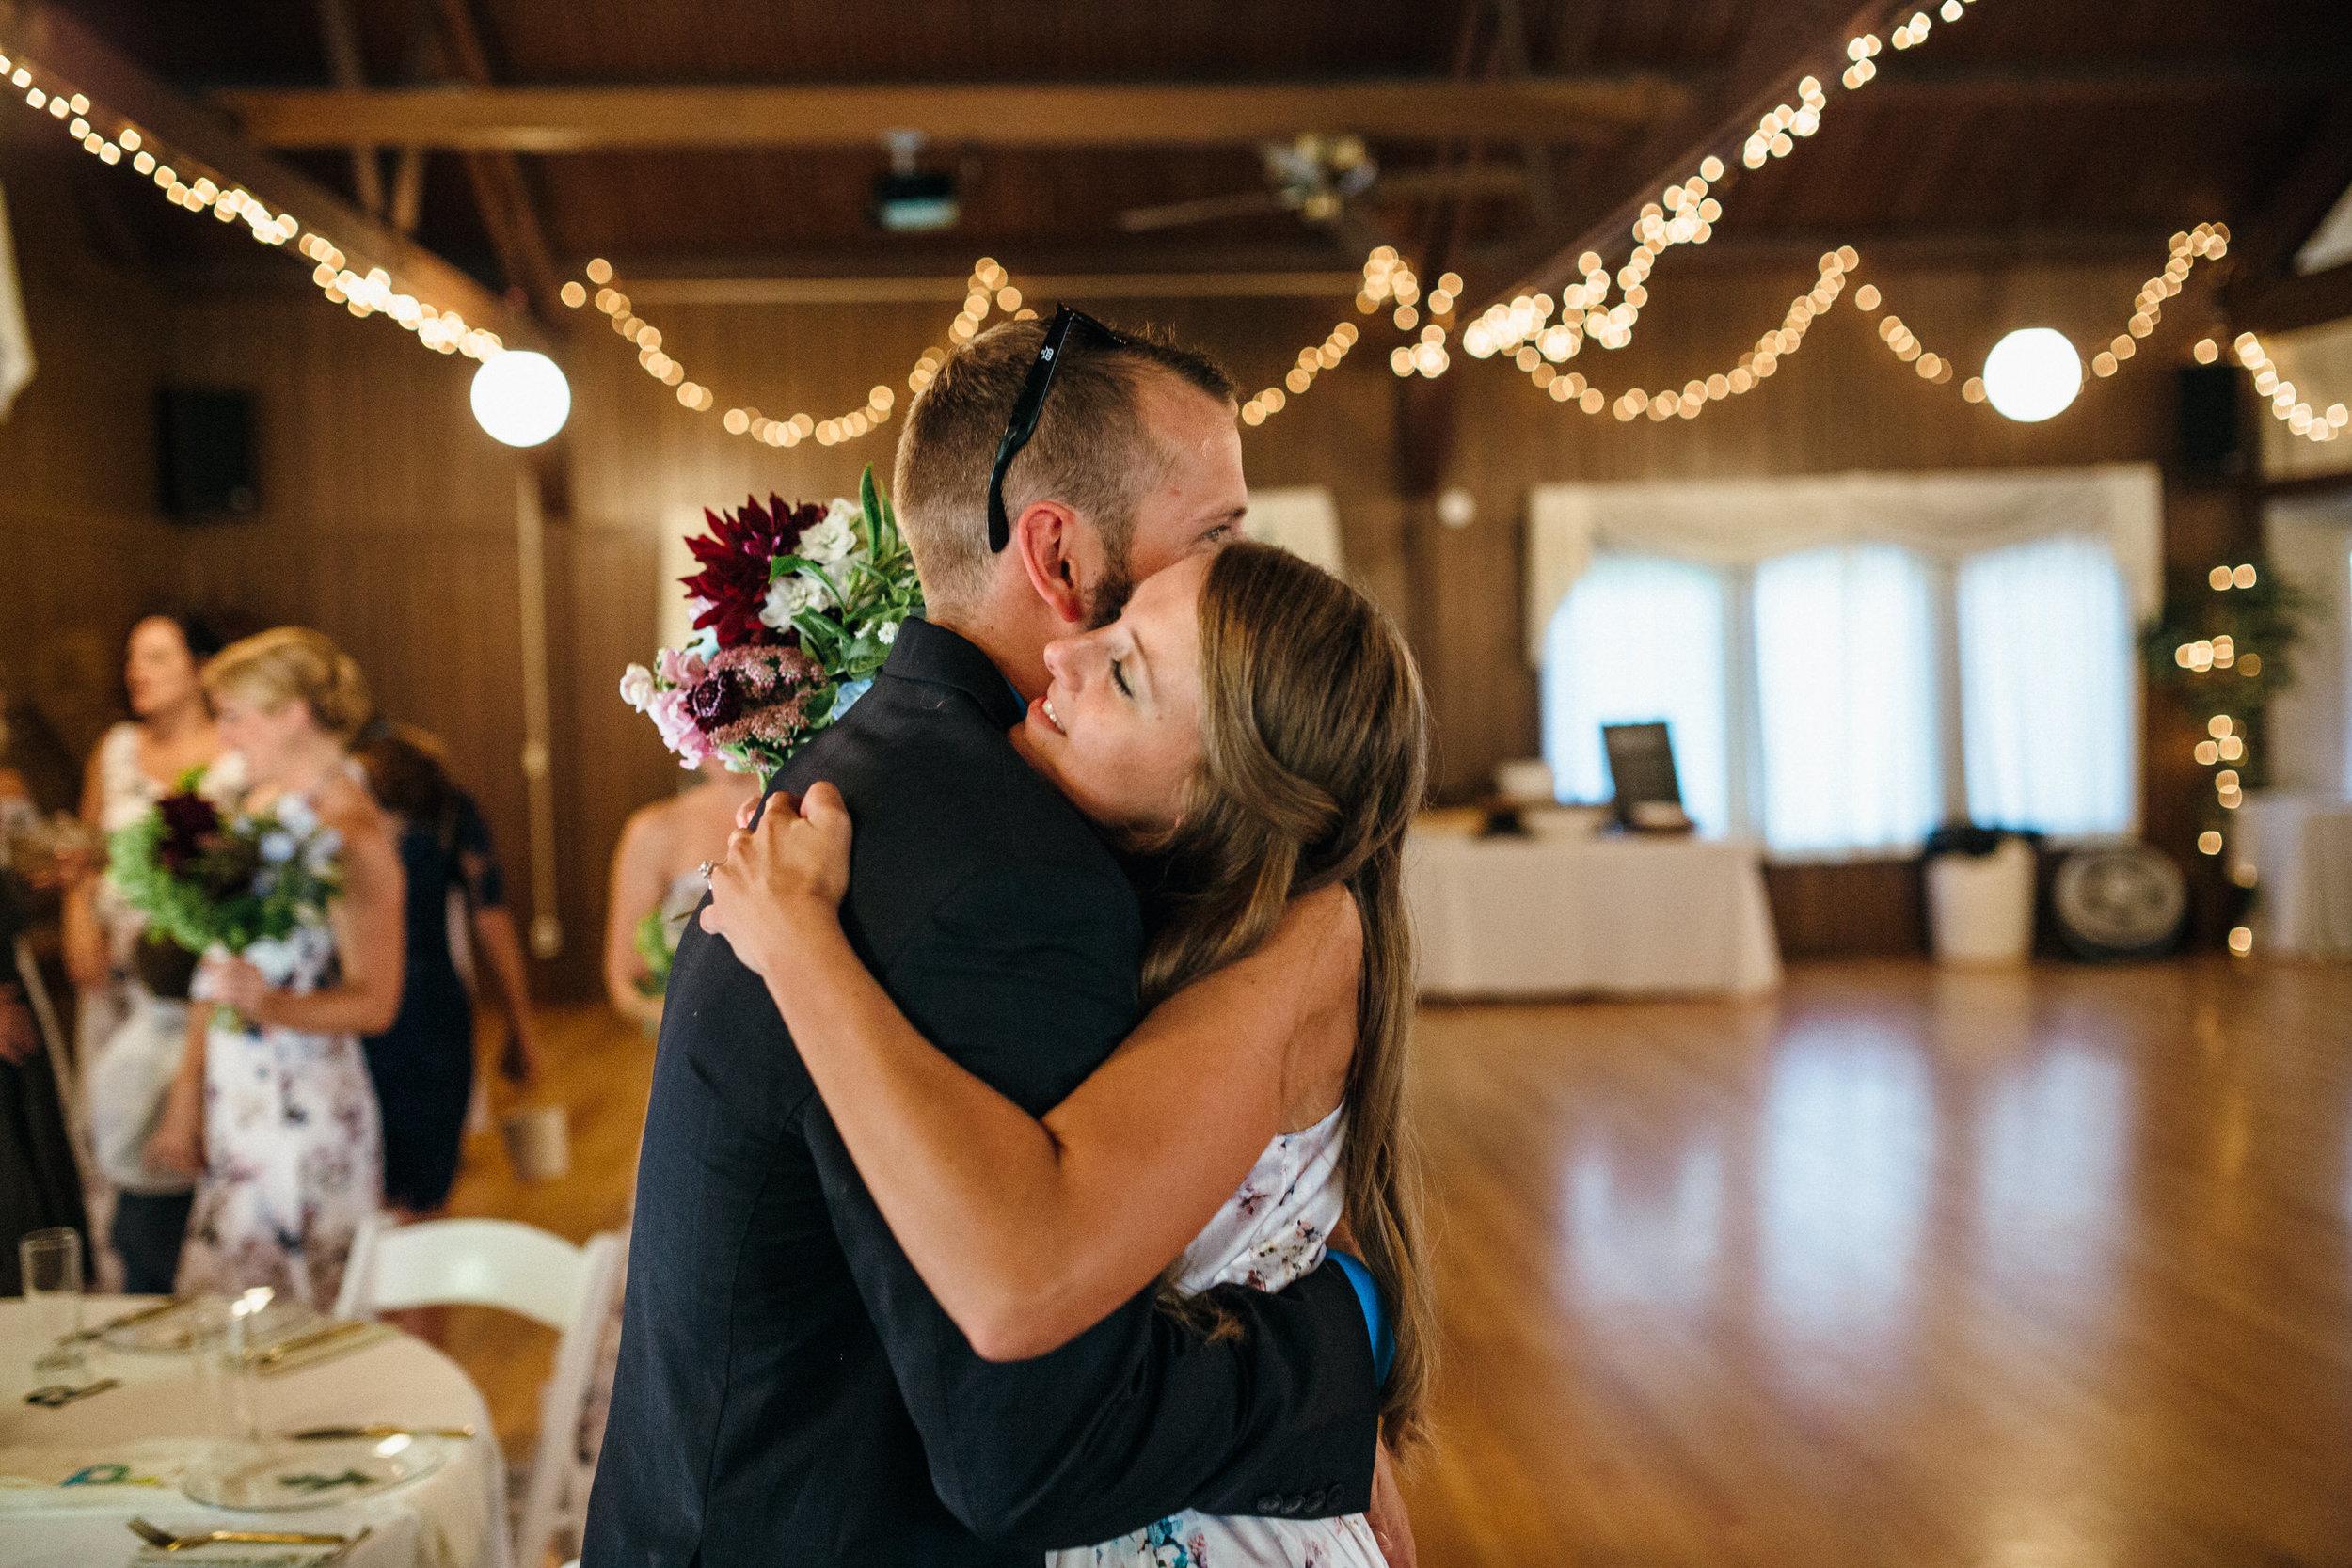 Laurelhurst Park club wedding photographer Portand pdx Oregon068.JPG